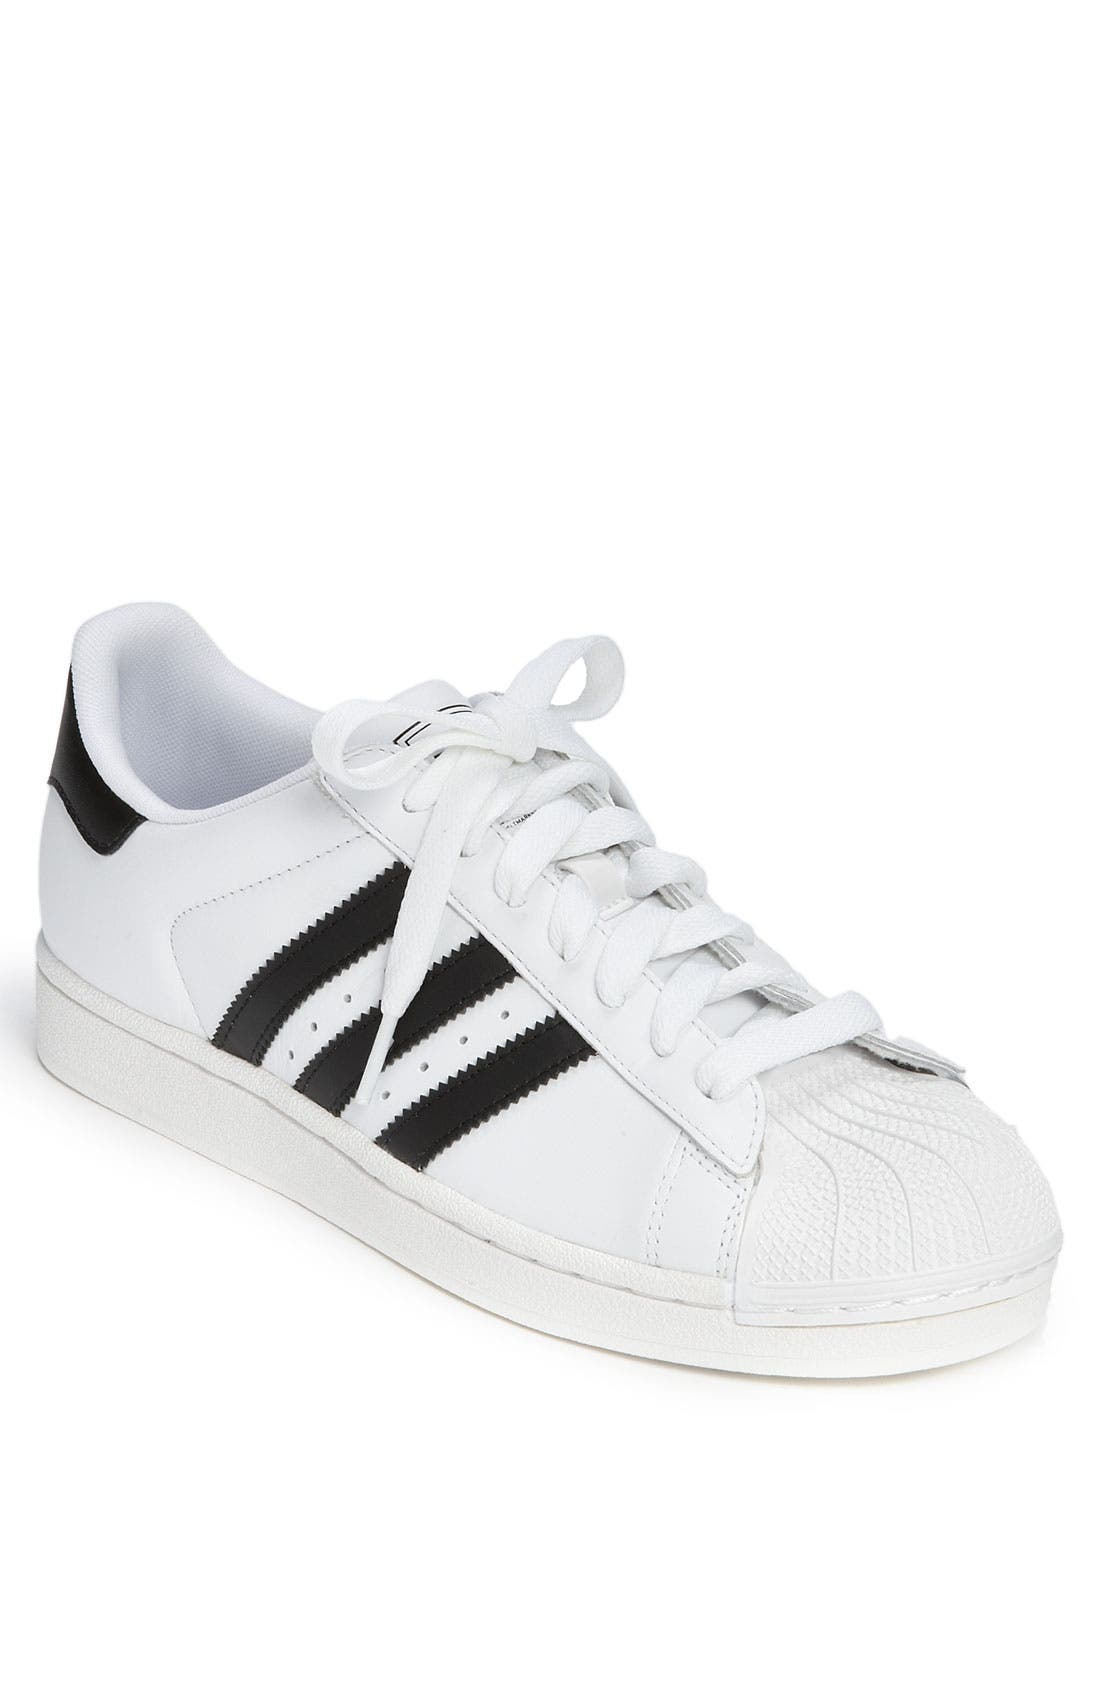 Main Image - adidas 'Superstar II' Sneaker (Men) (Online Only)